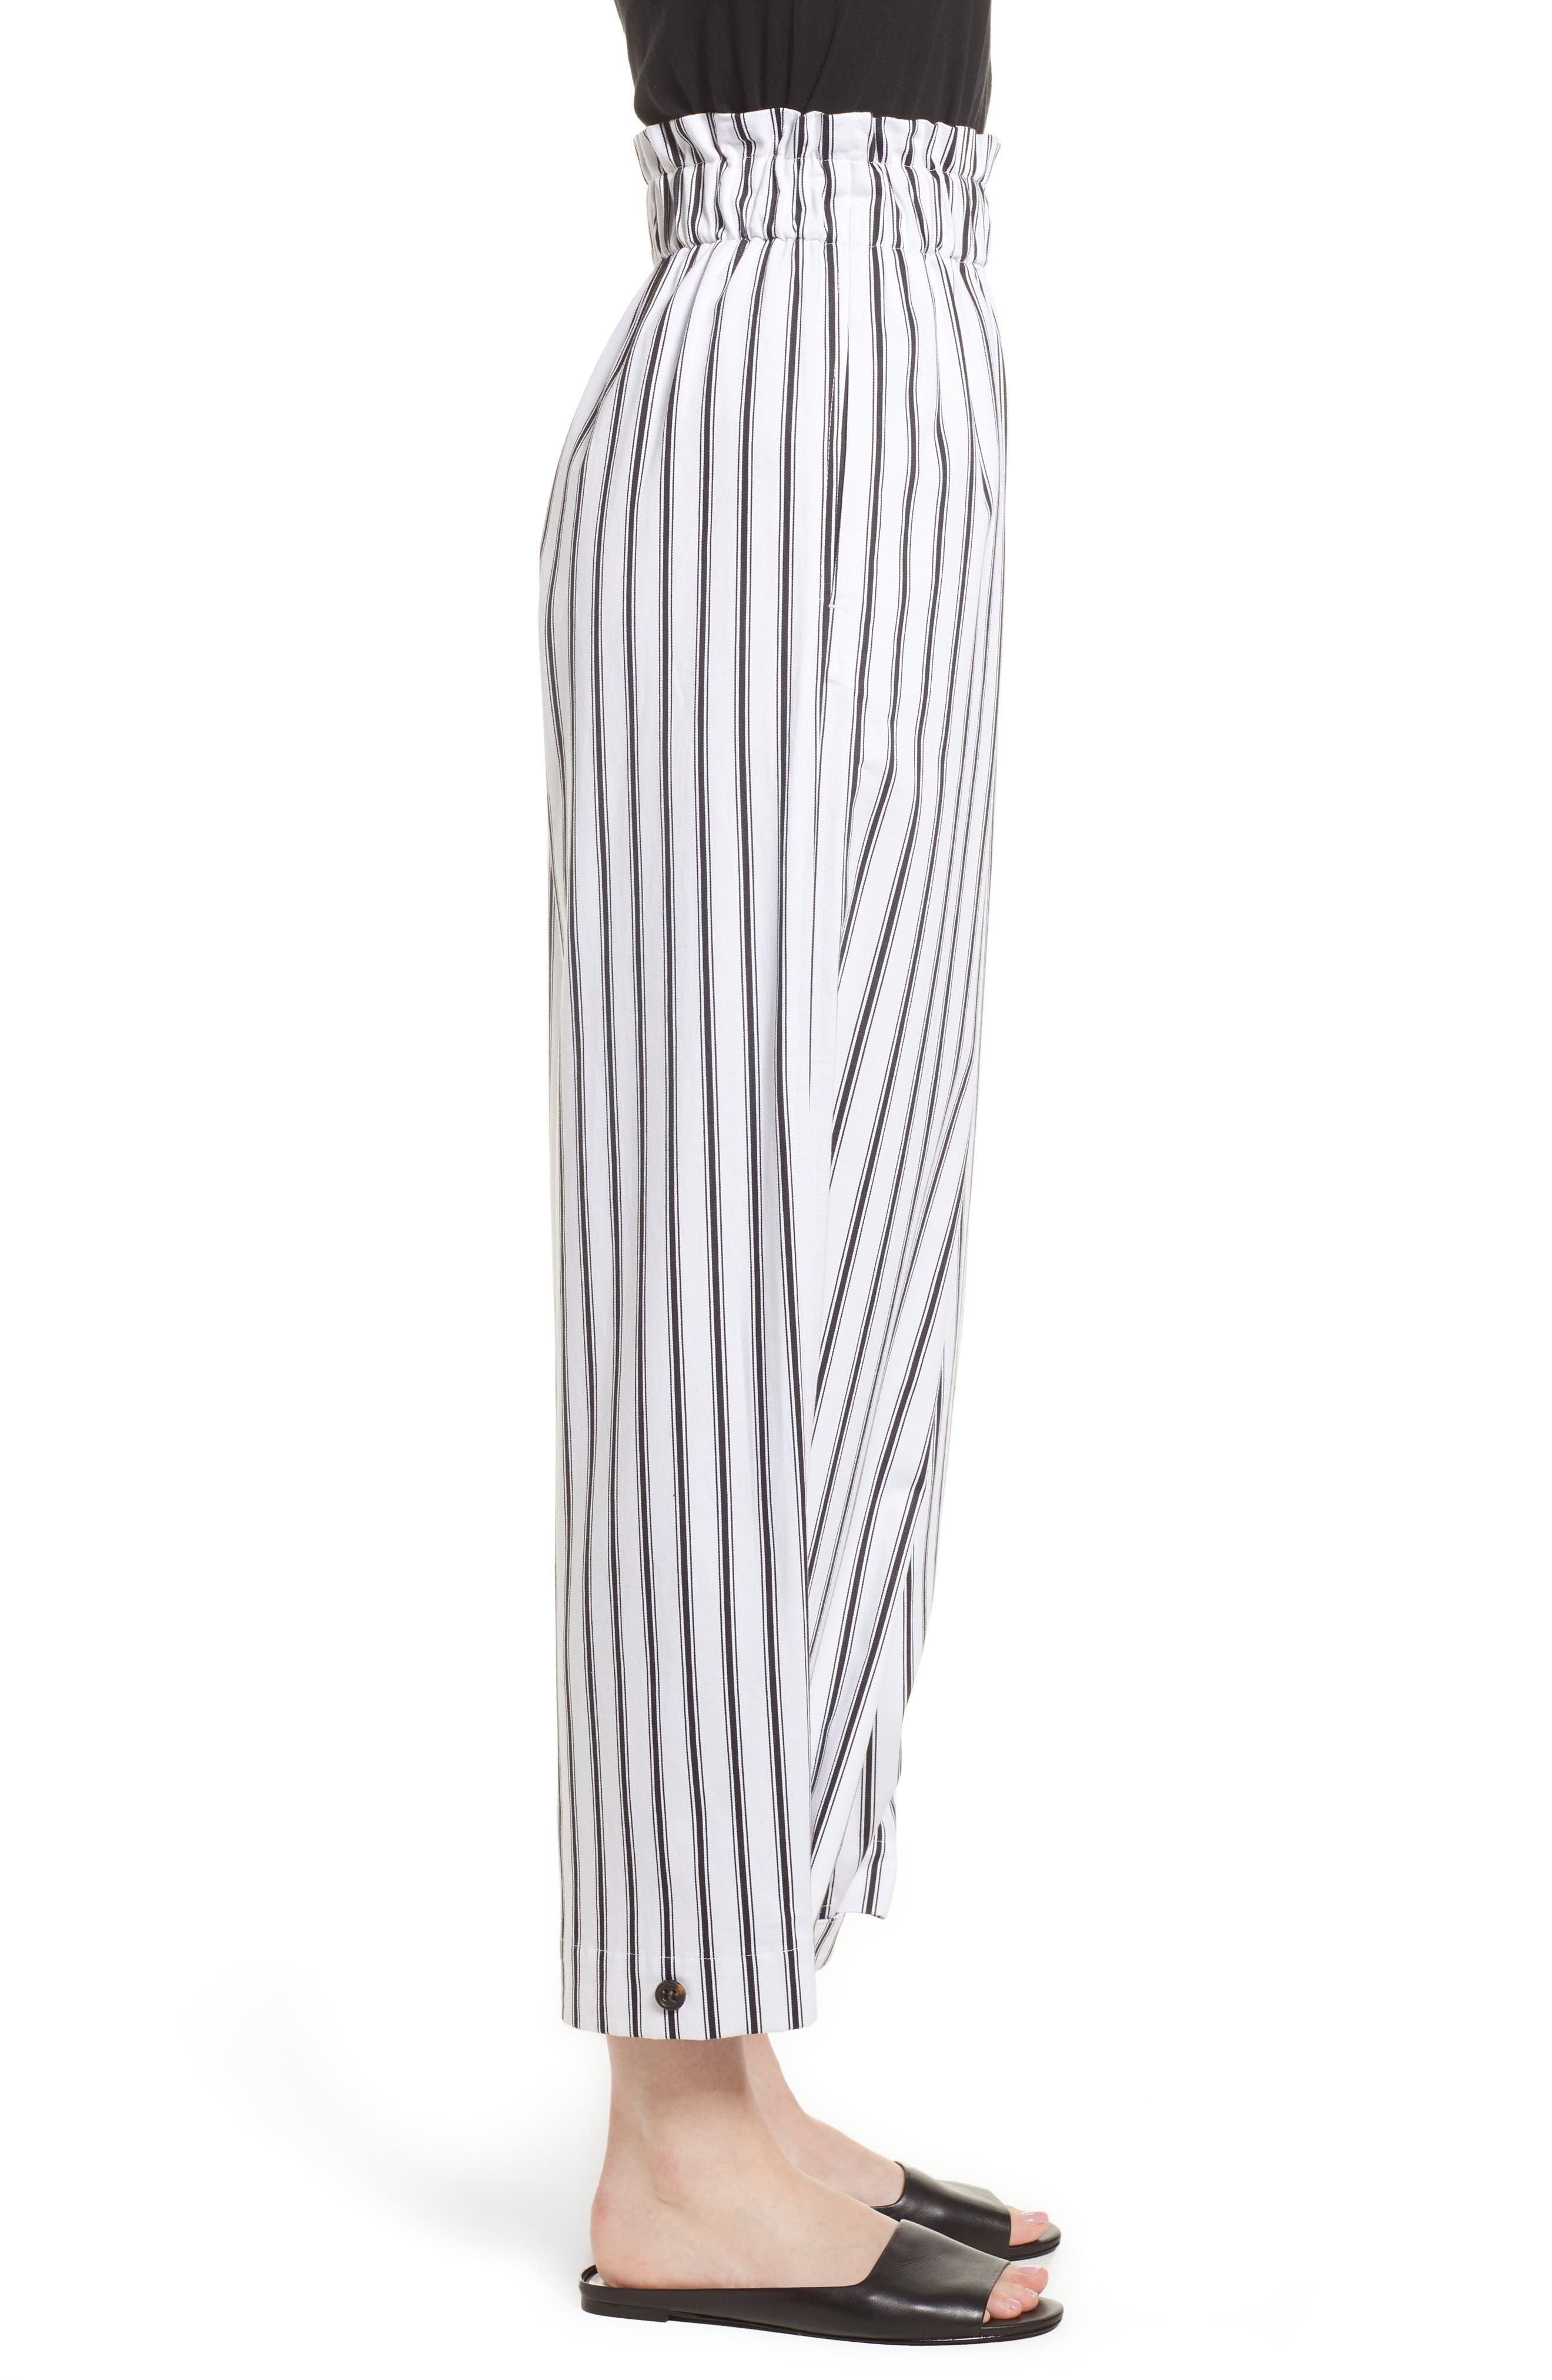 High Waist Convertible Wide Leg Pants,                             Alternate thumbnail 3, color,                             Black/ White Striped